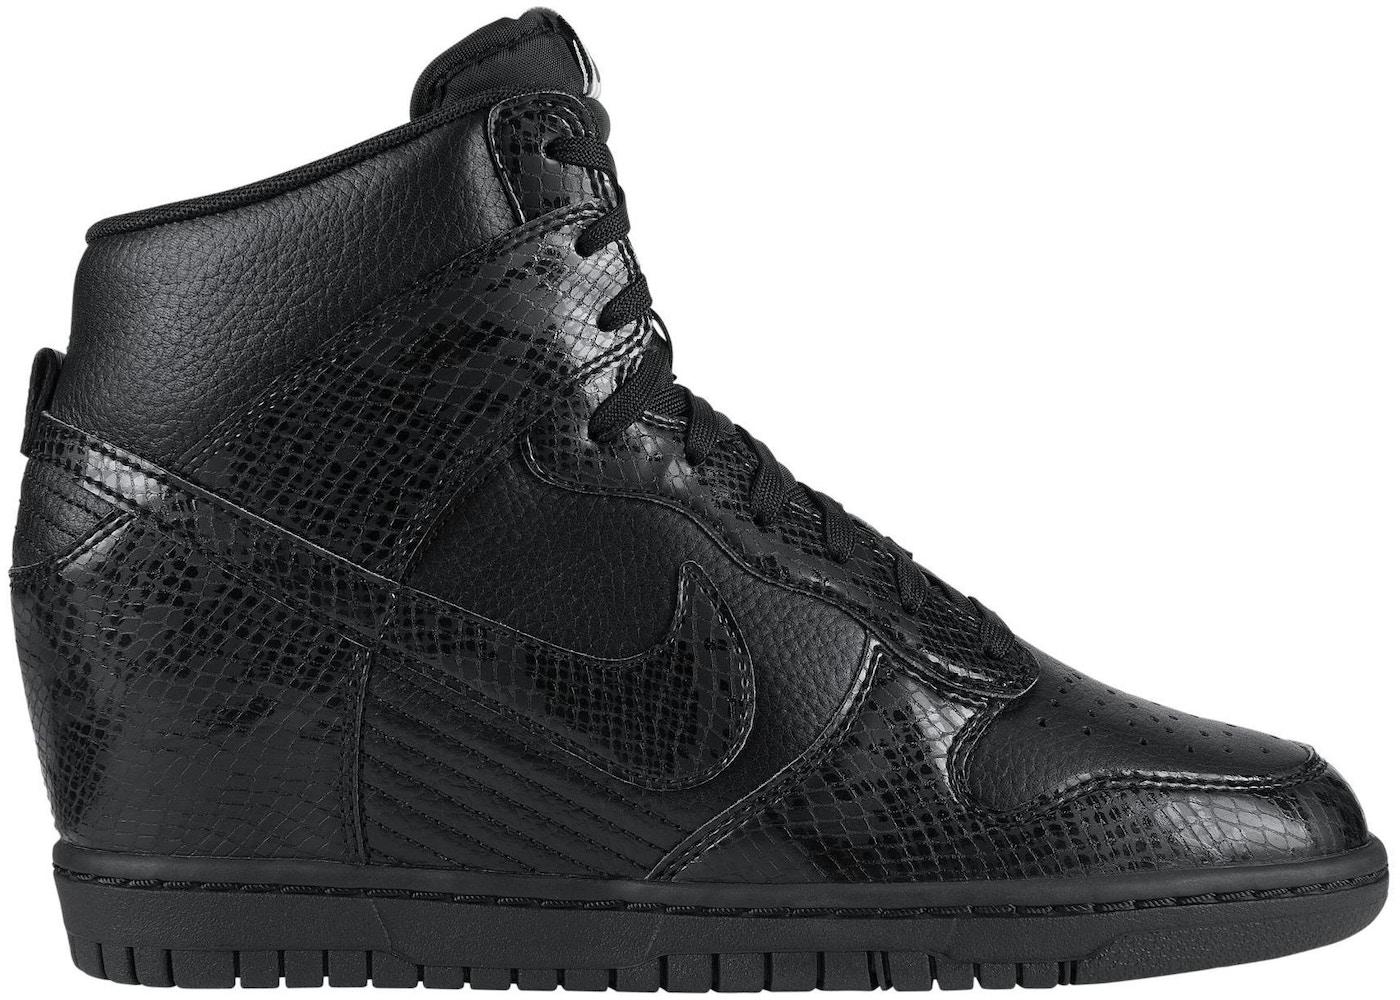 new products 0837f 7e7e7 Nike Dunk High Sky Hi Black Leather Snake (GS) - 528899-010